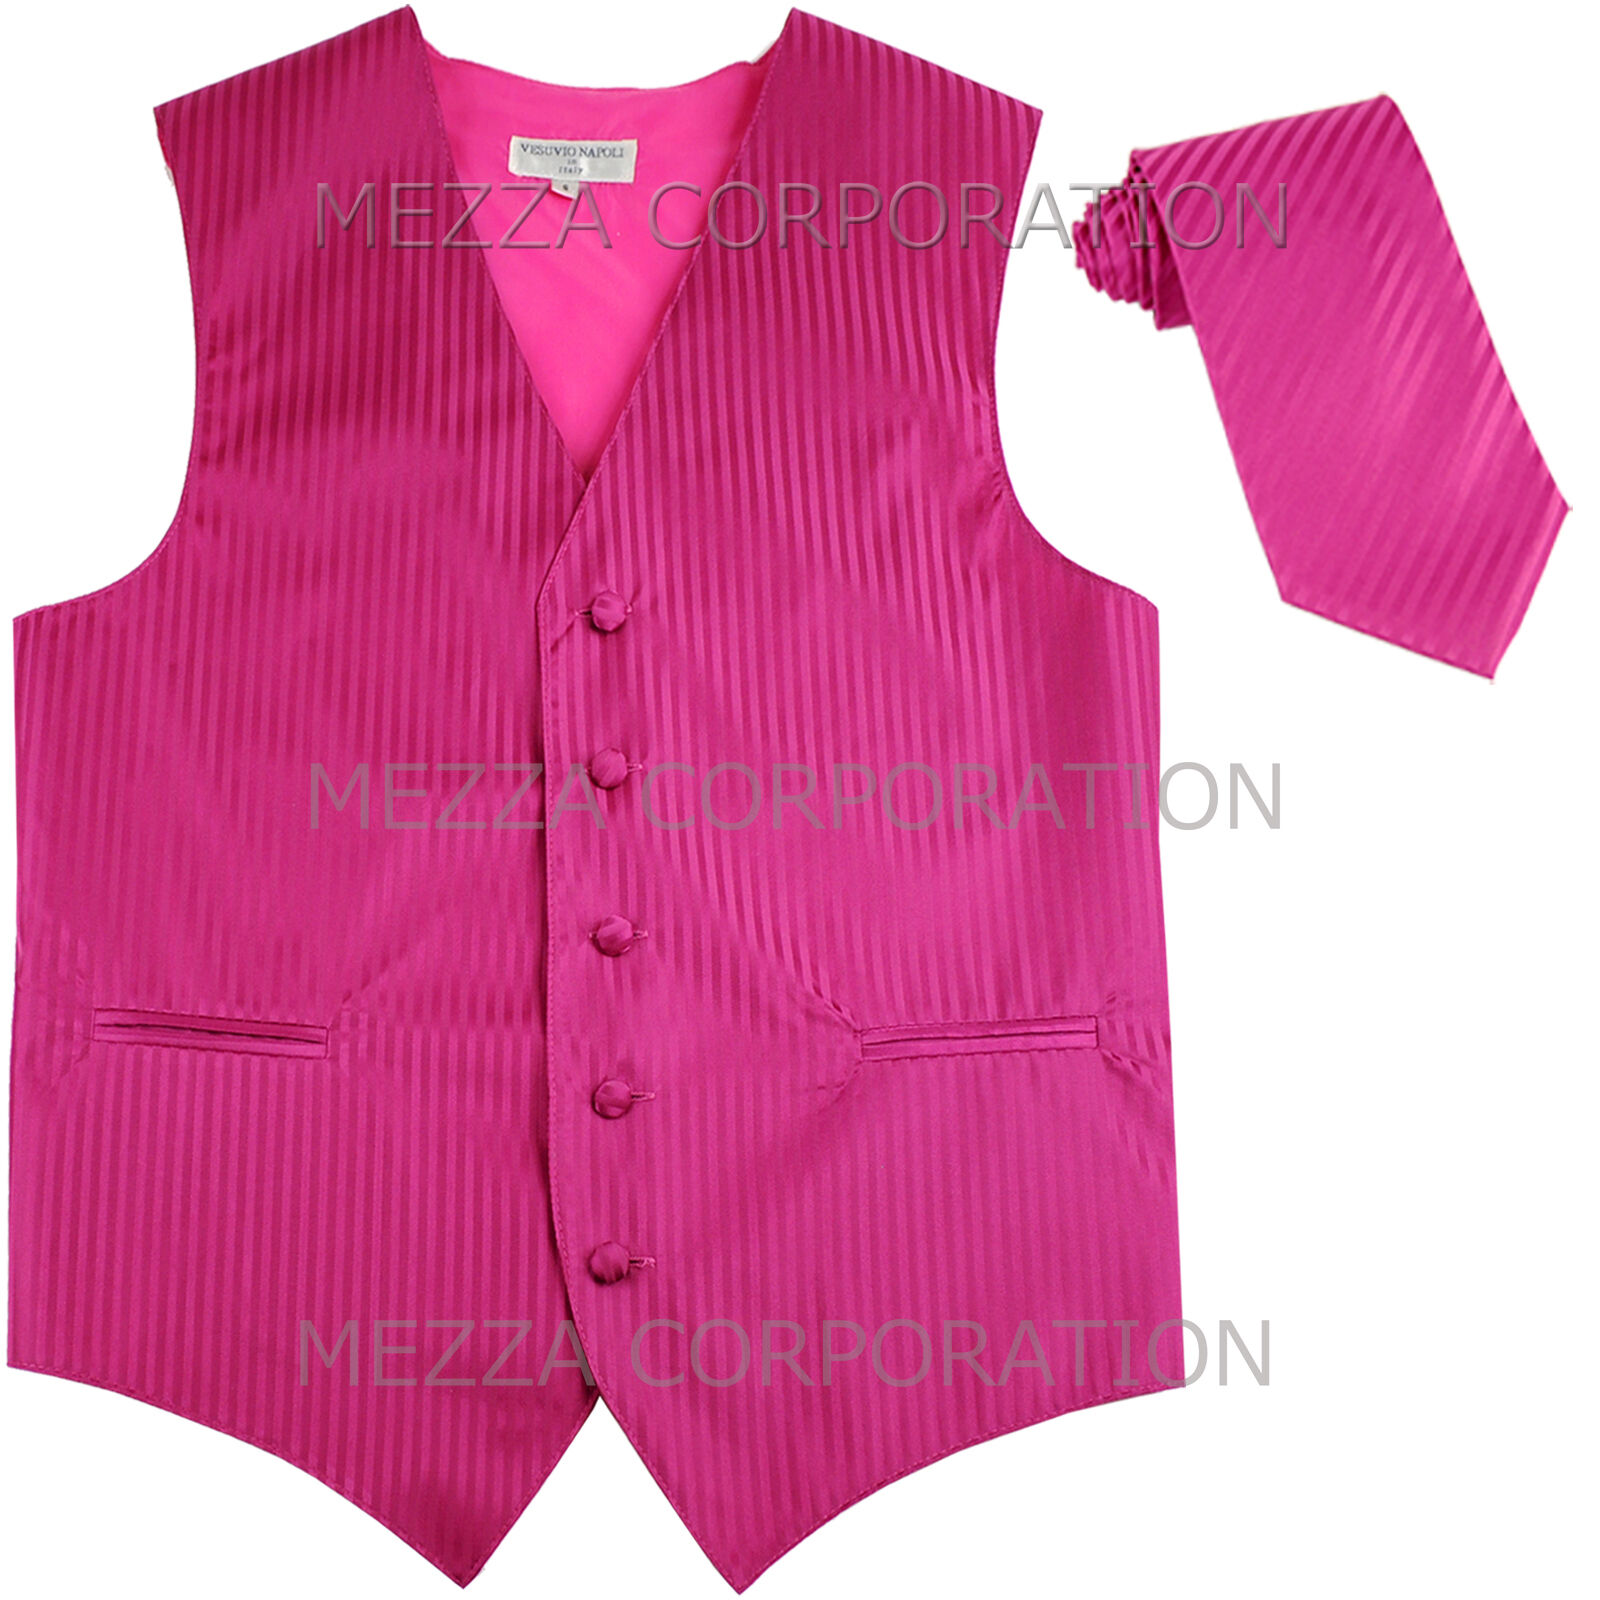 New Men's Tuxedo Vest Waistcoat Vertical Stripes Necktie prom party Hot Pink